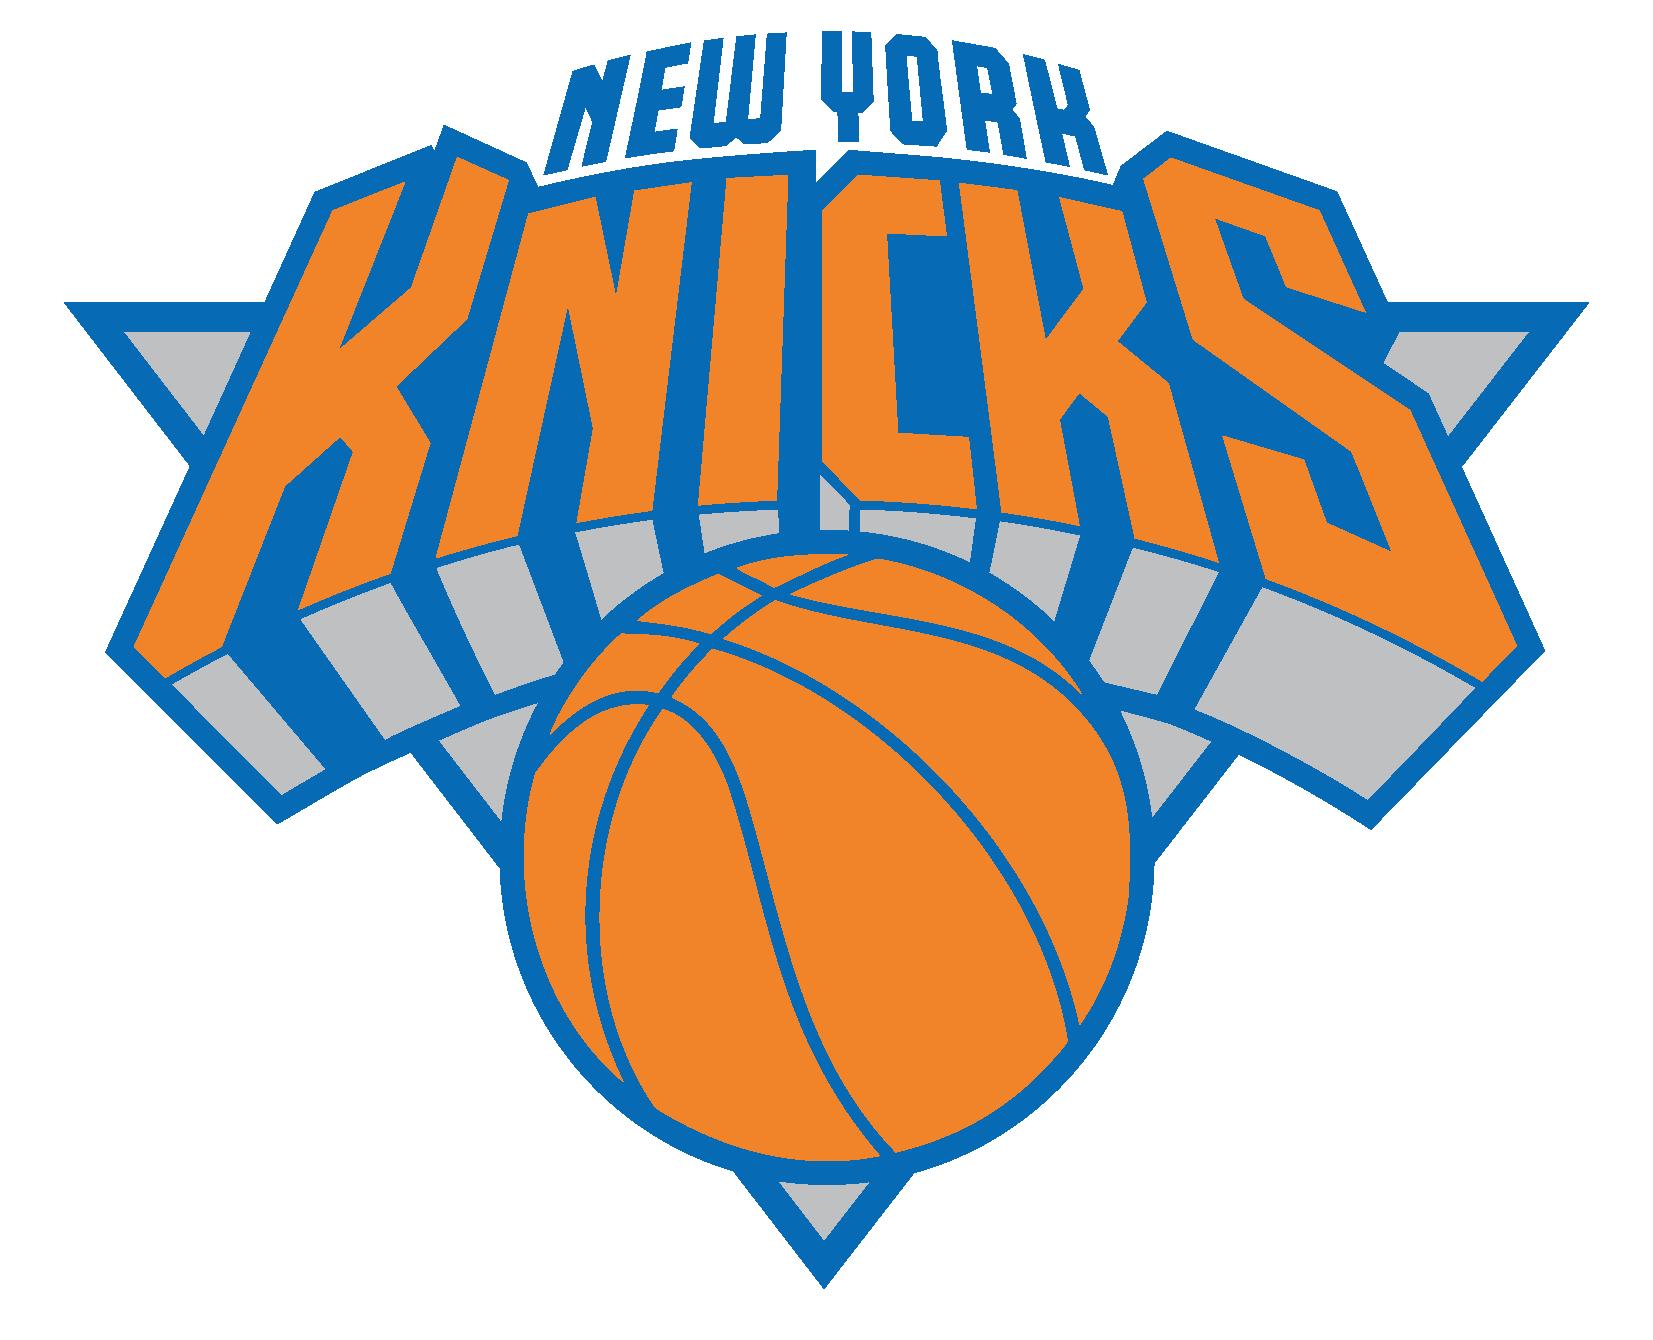 Knicks Logo New York Vector New York Knicks Logo Nba New York Knicks Basketball